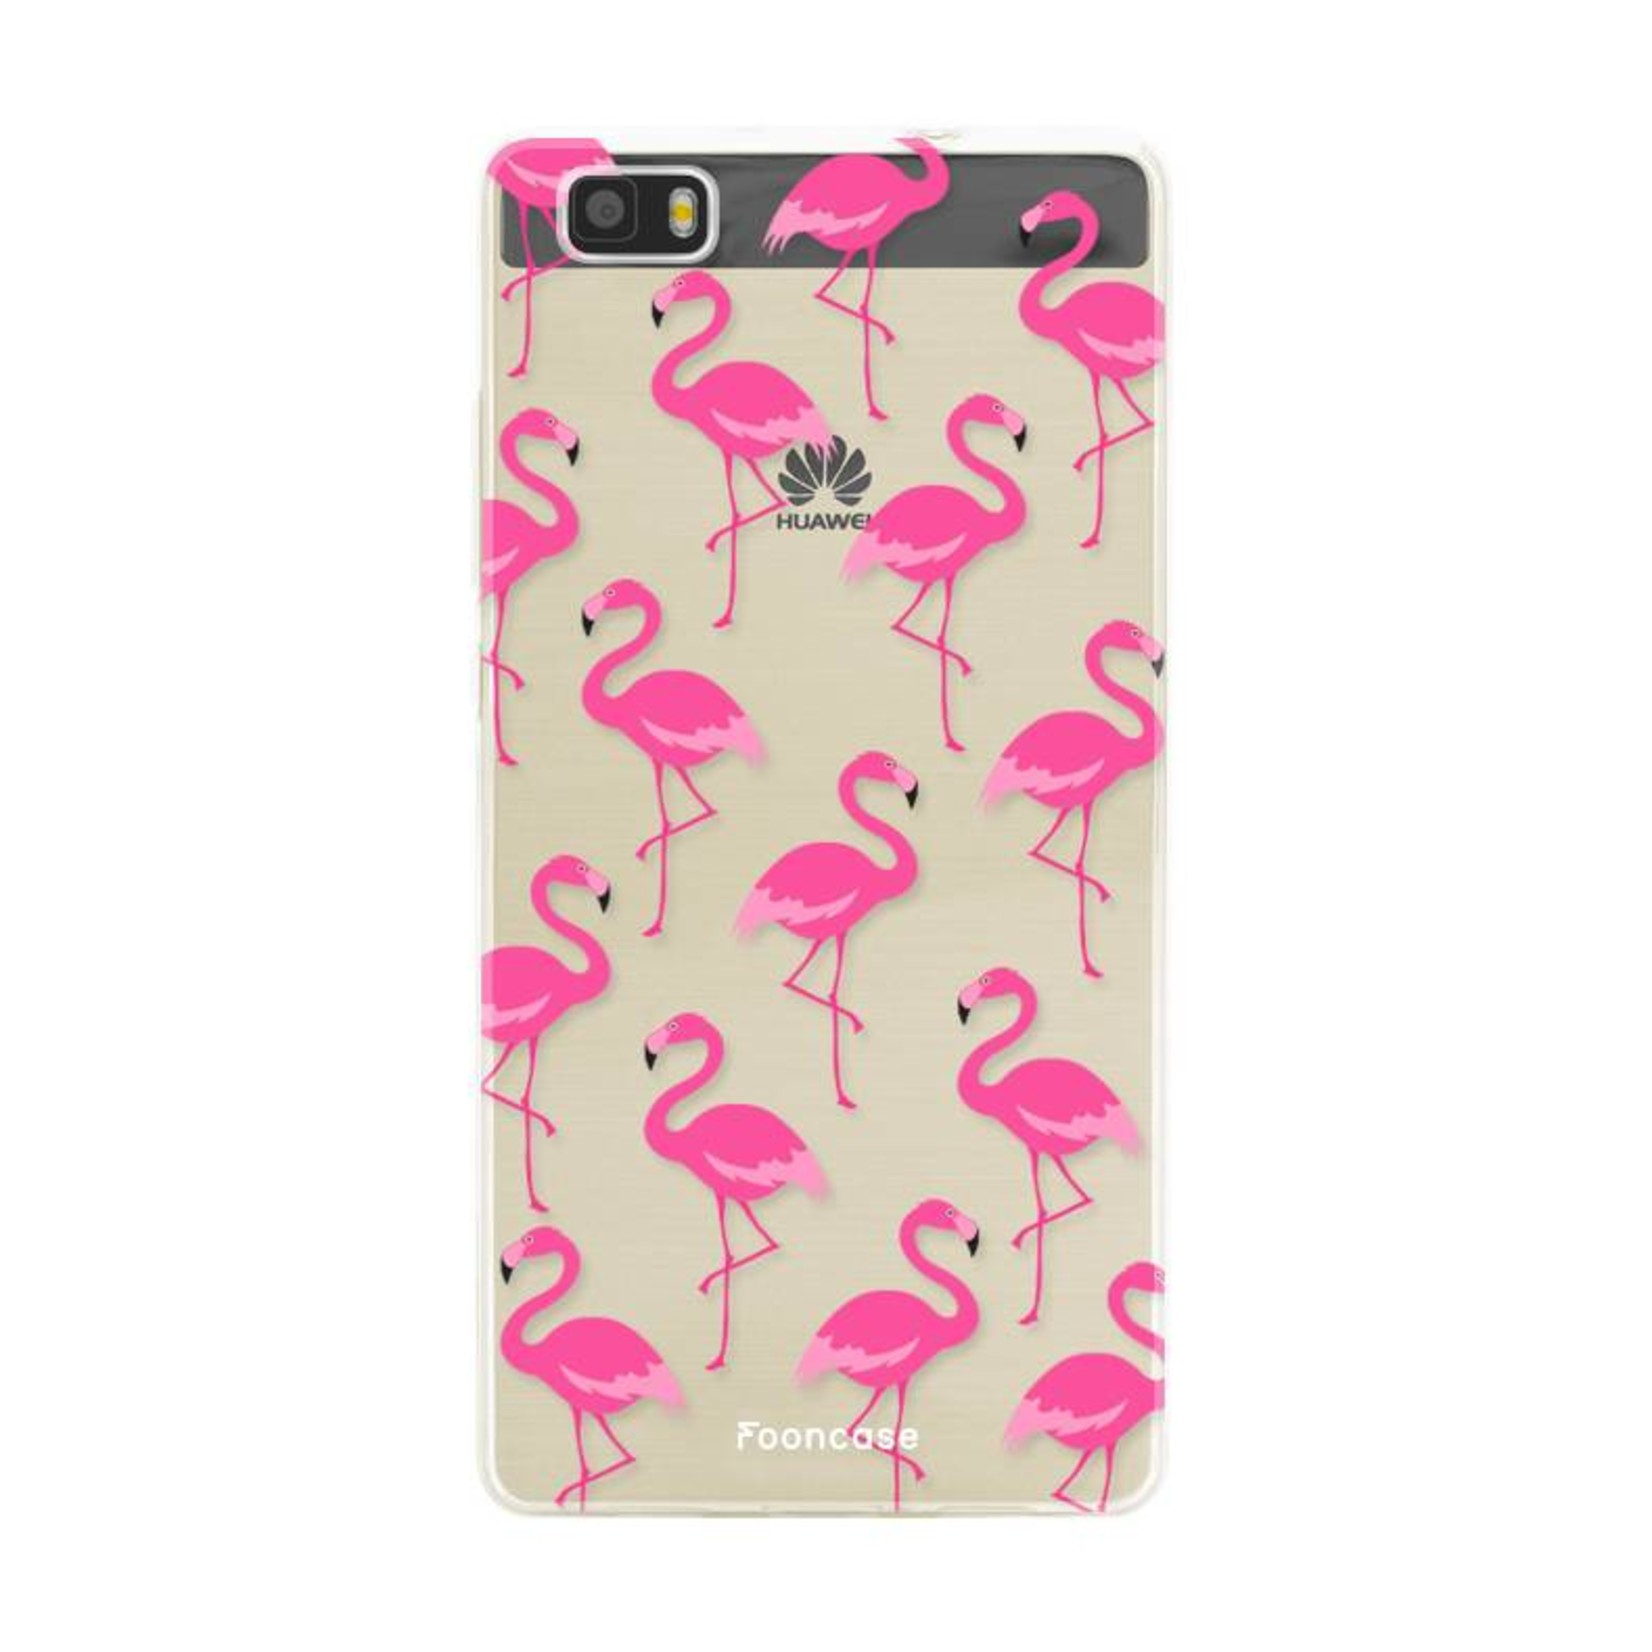 FOONCASE Huawei P8 Lite 2016 Handyhülle - Flamingo